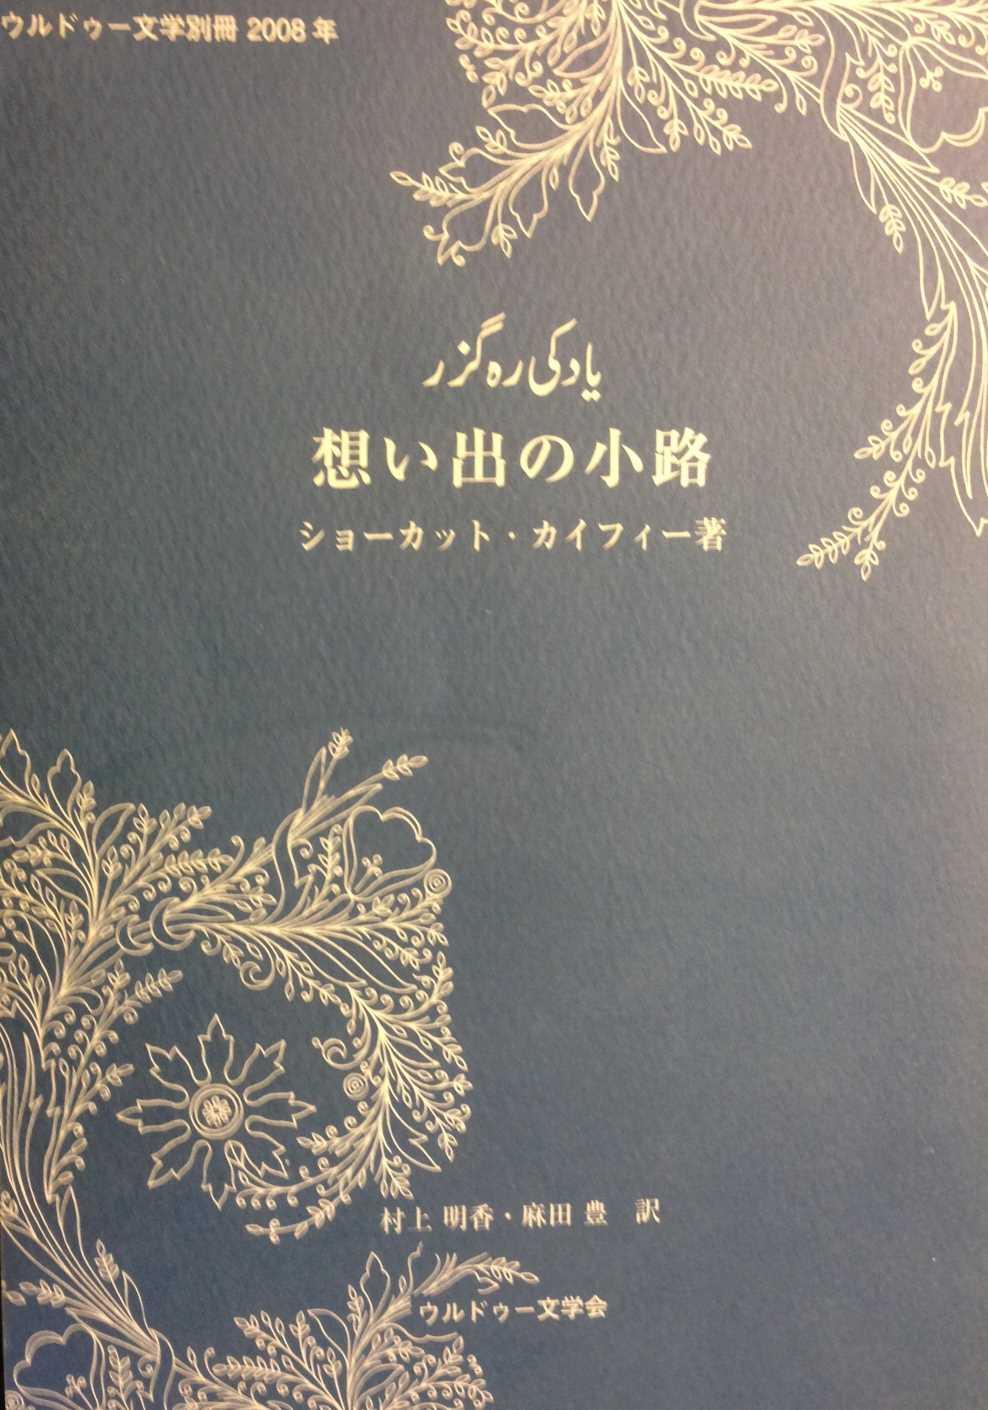 Yaad ki Rehguzar in Japani